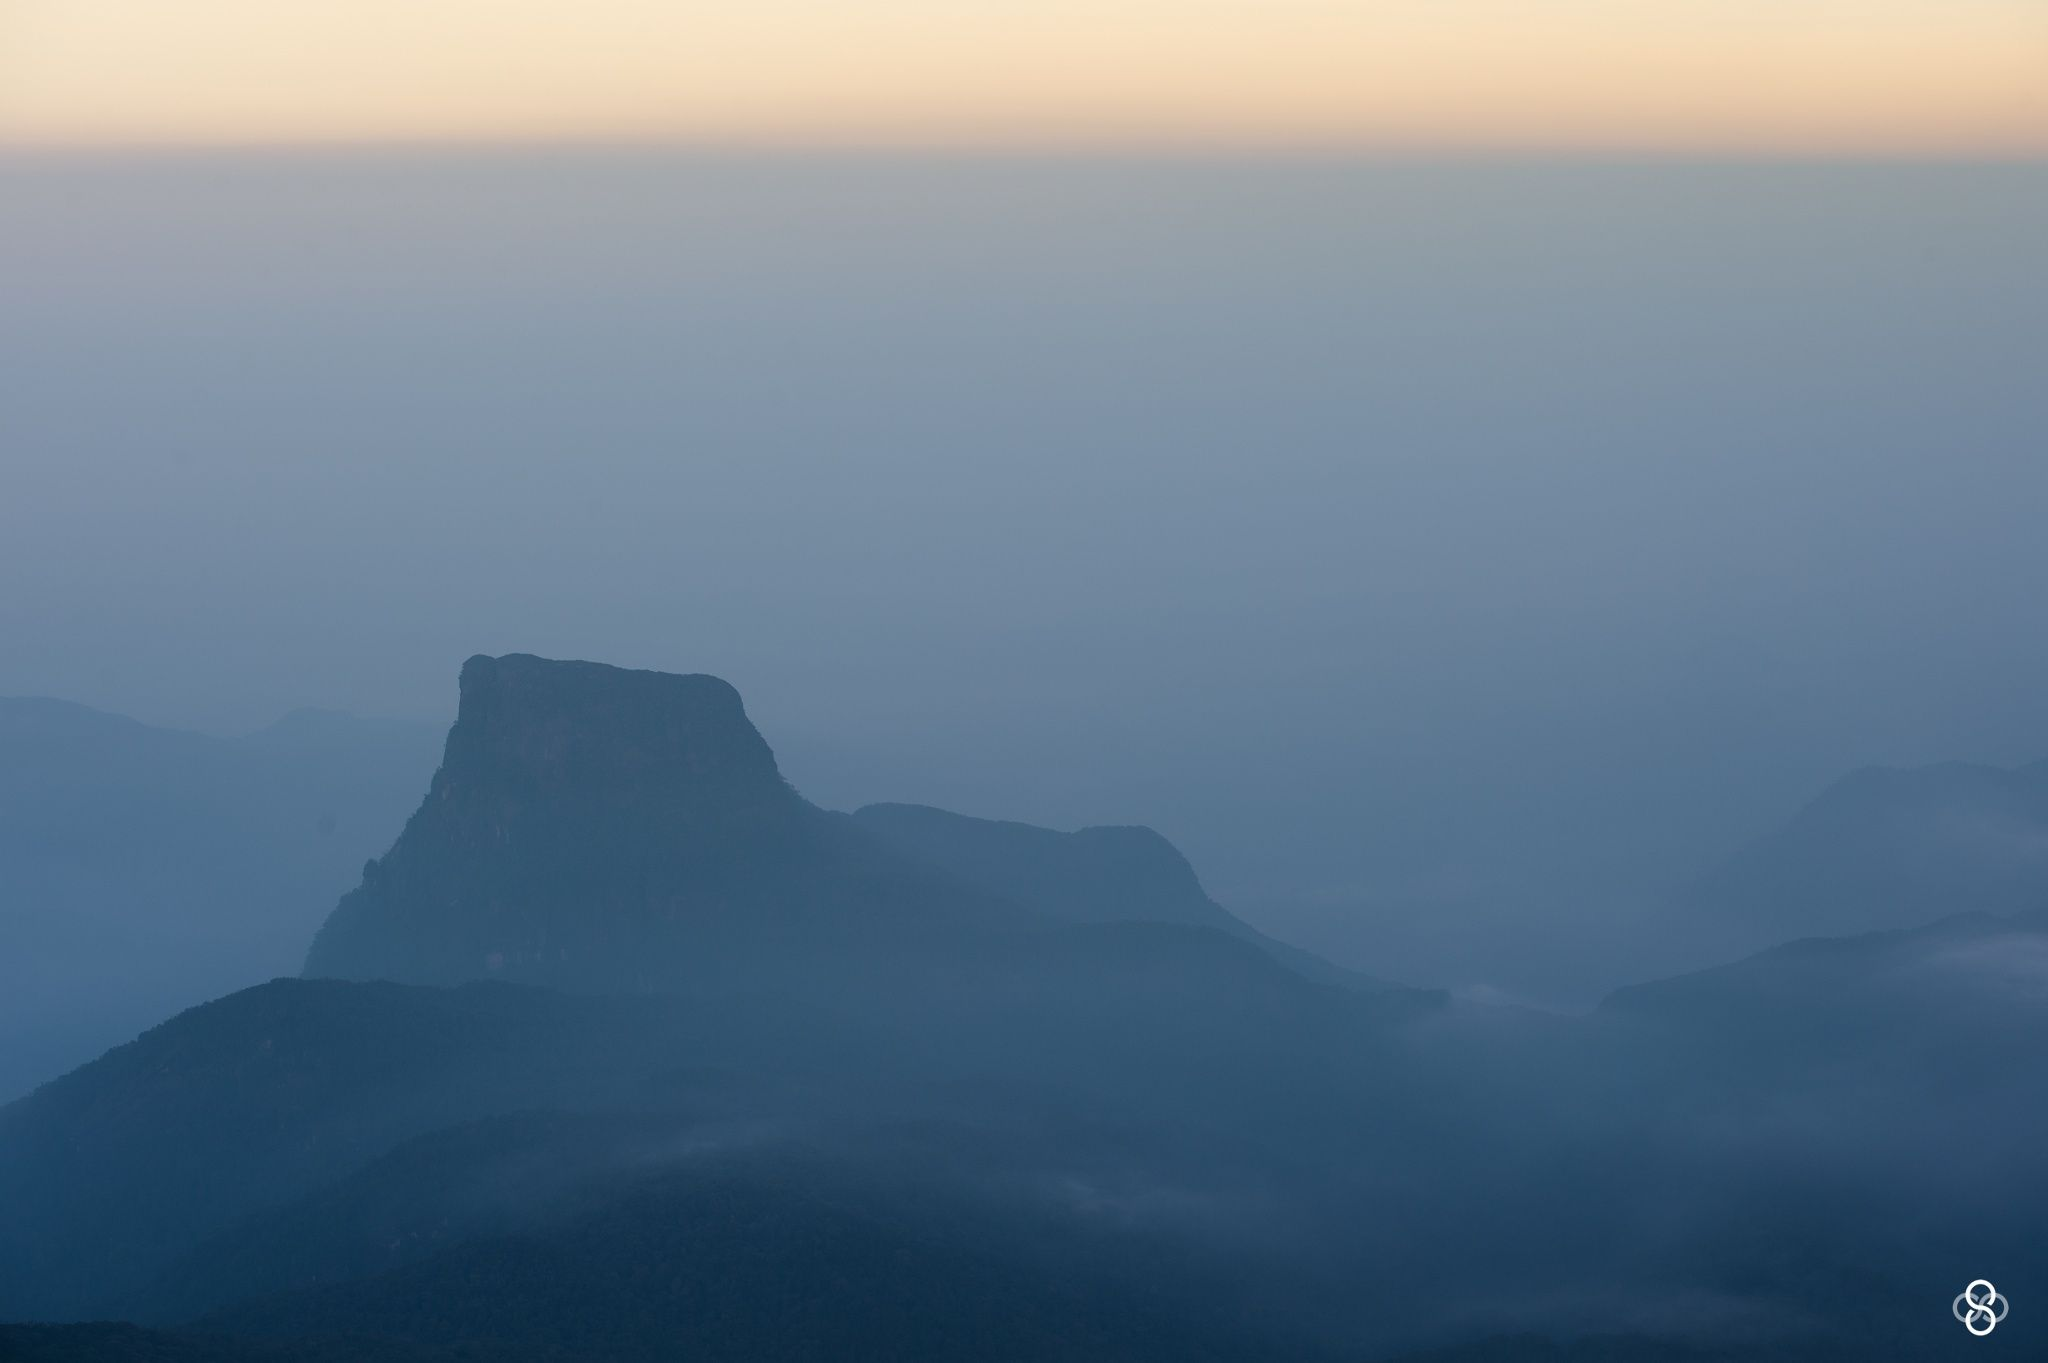 'Paradise' - 1 by Subodh Shetty on 500px #Srilanka #Adams #Peak #Sripada #Buddhism #Sunrise #Travel #Photography